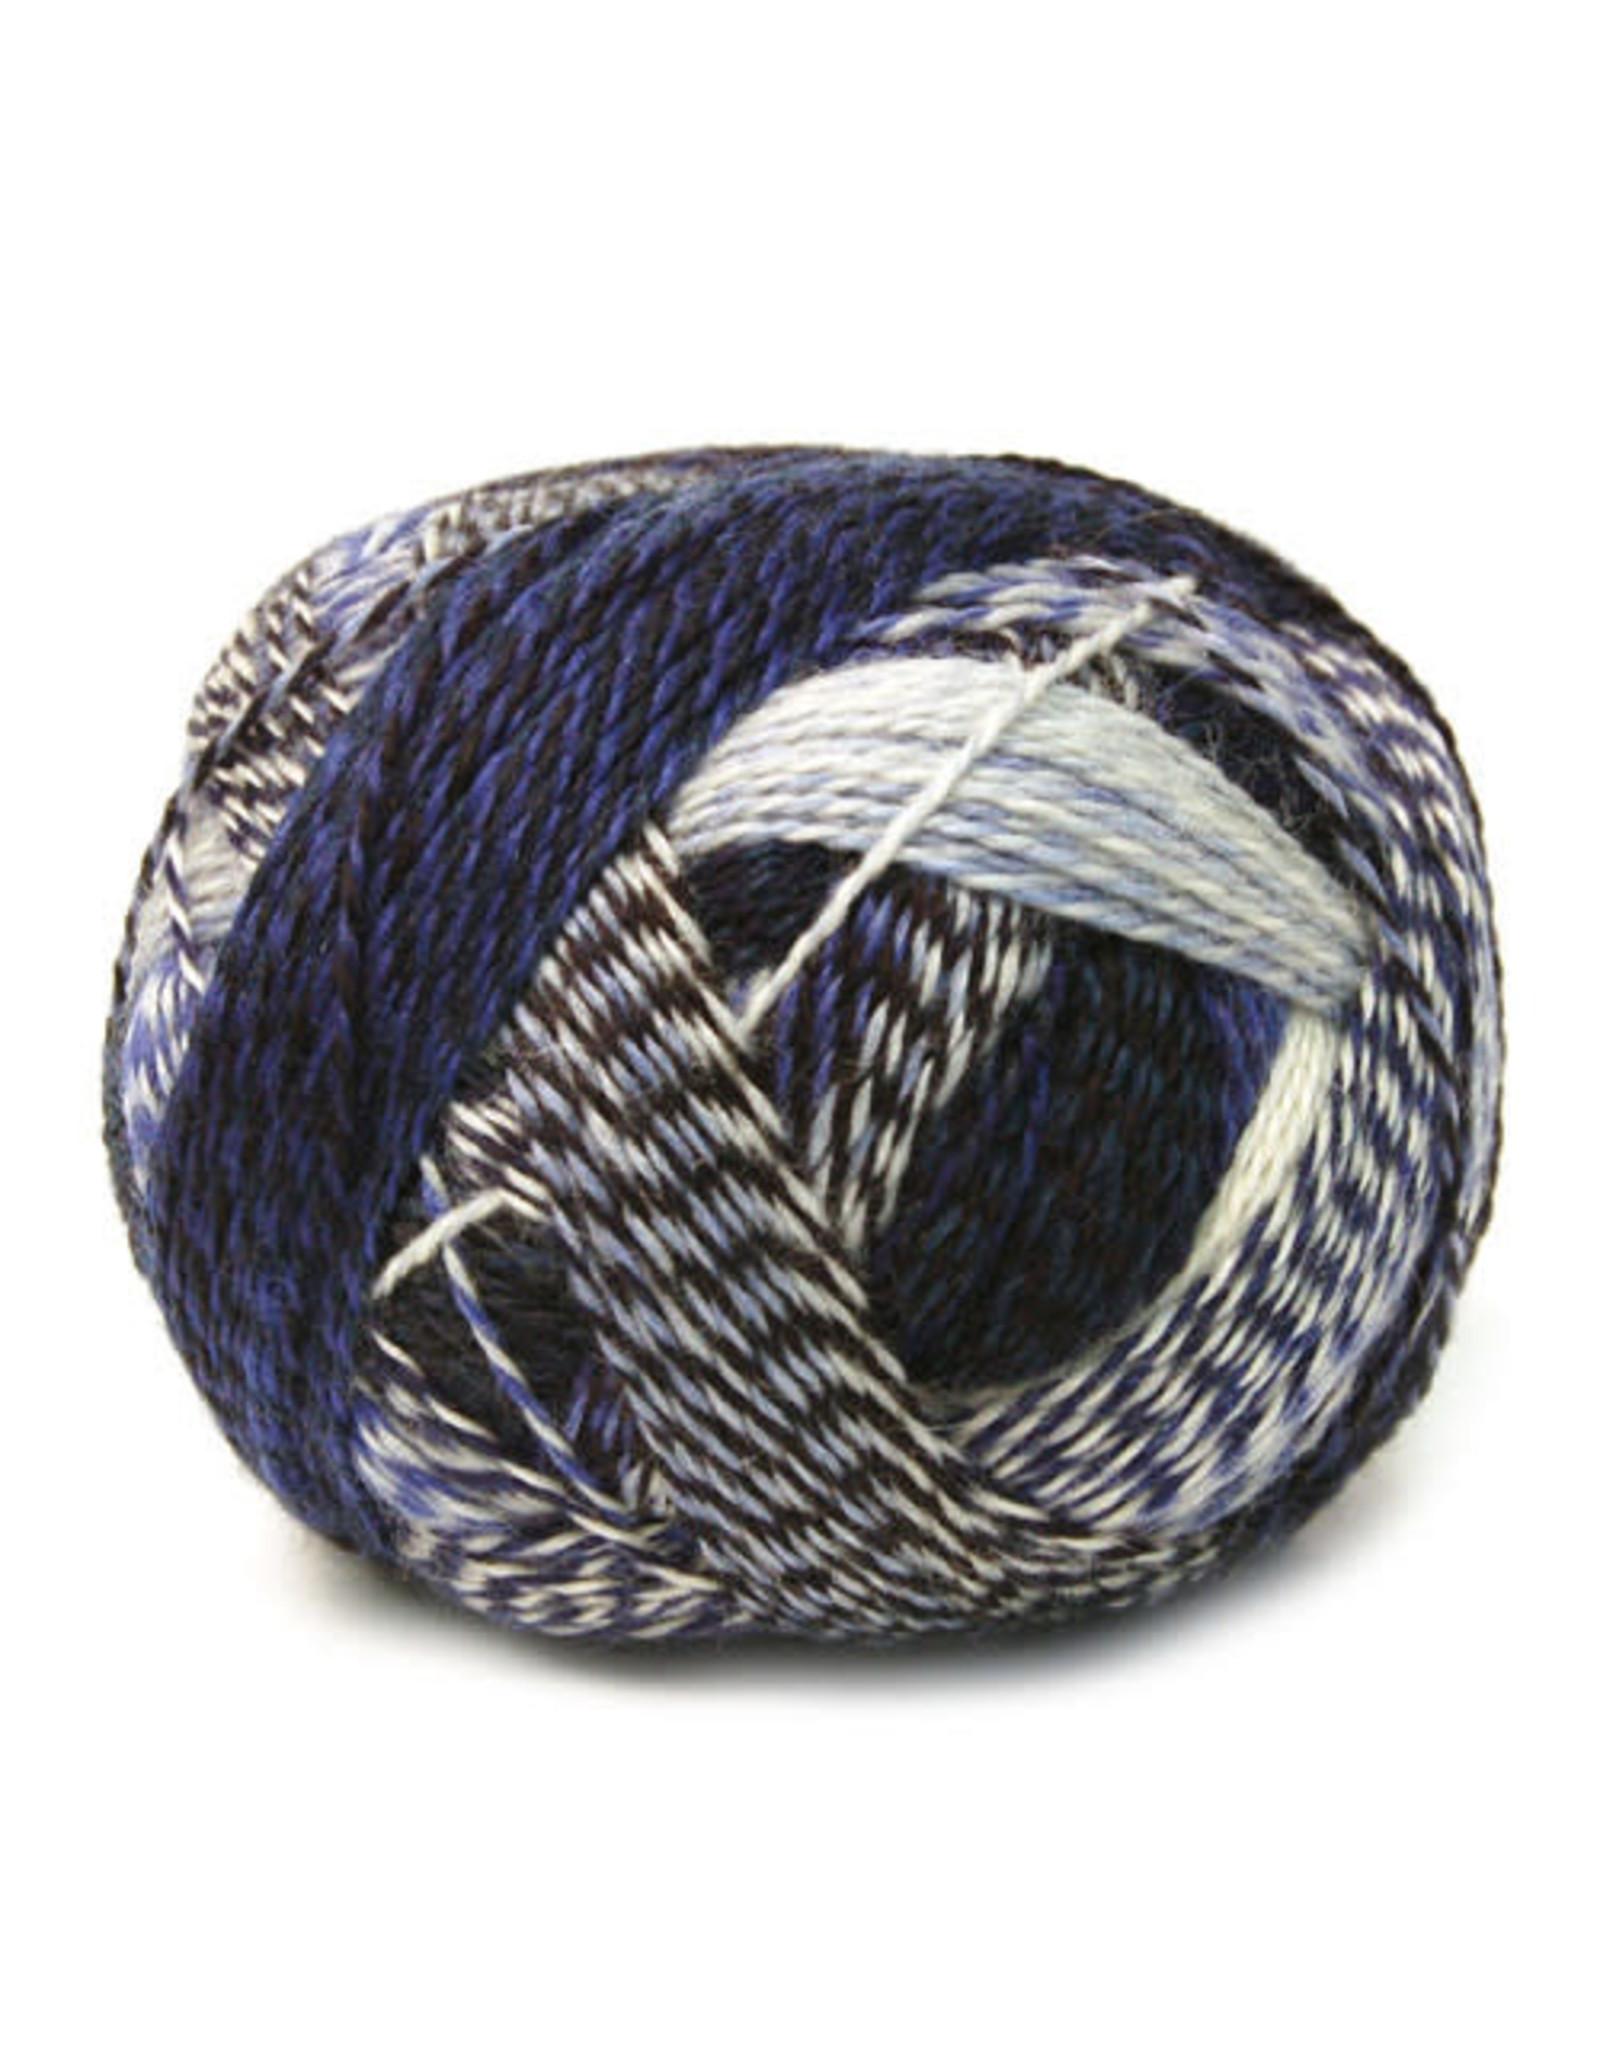 Scoppel-Wolle 2099 - Zauberball Crazy - Schoppel Wolle